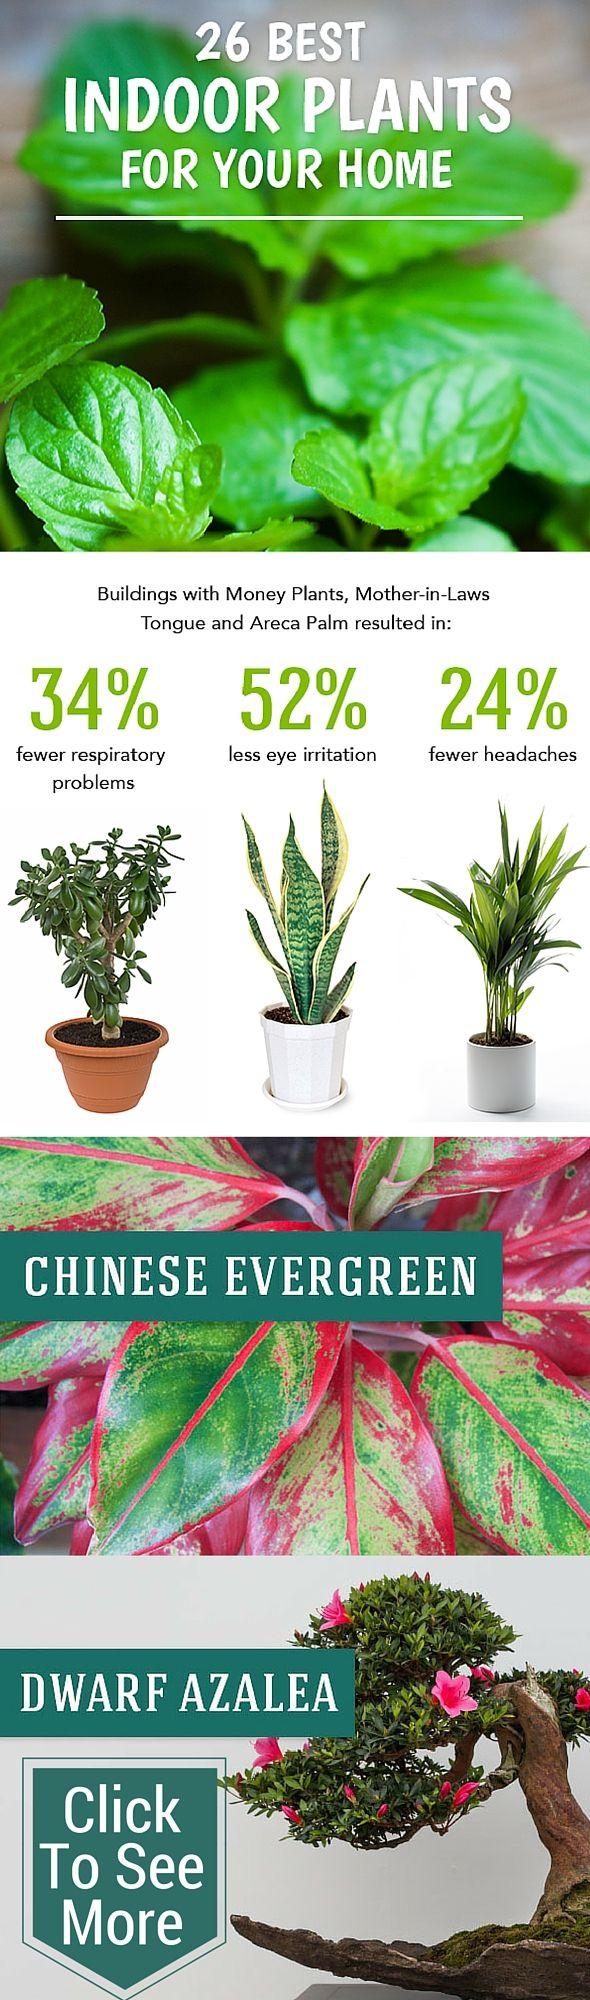 best indoor plants to help purify your air u2026 pinteres u2026